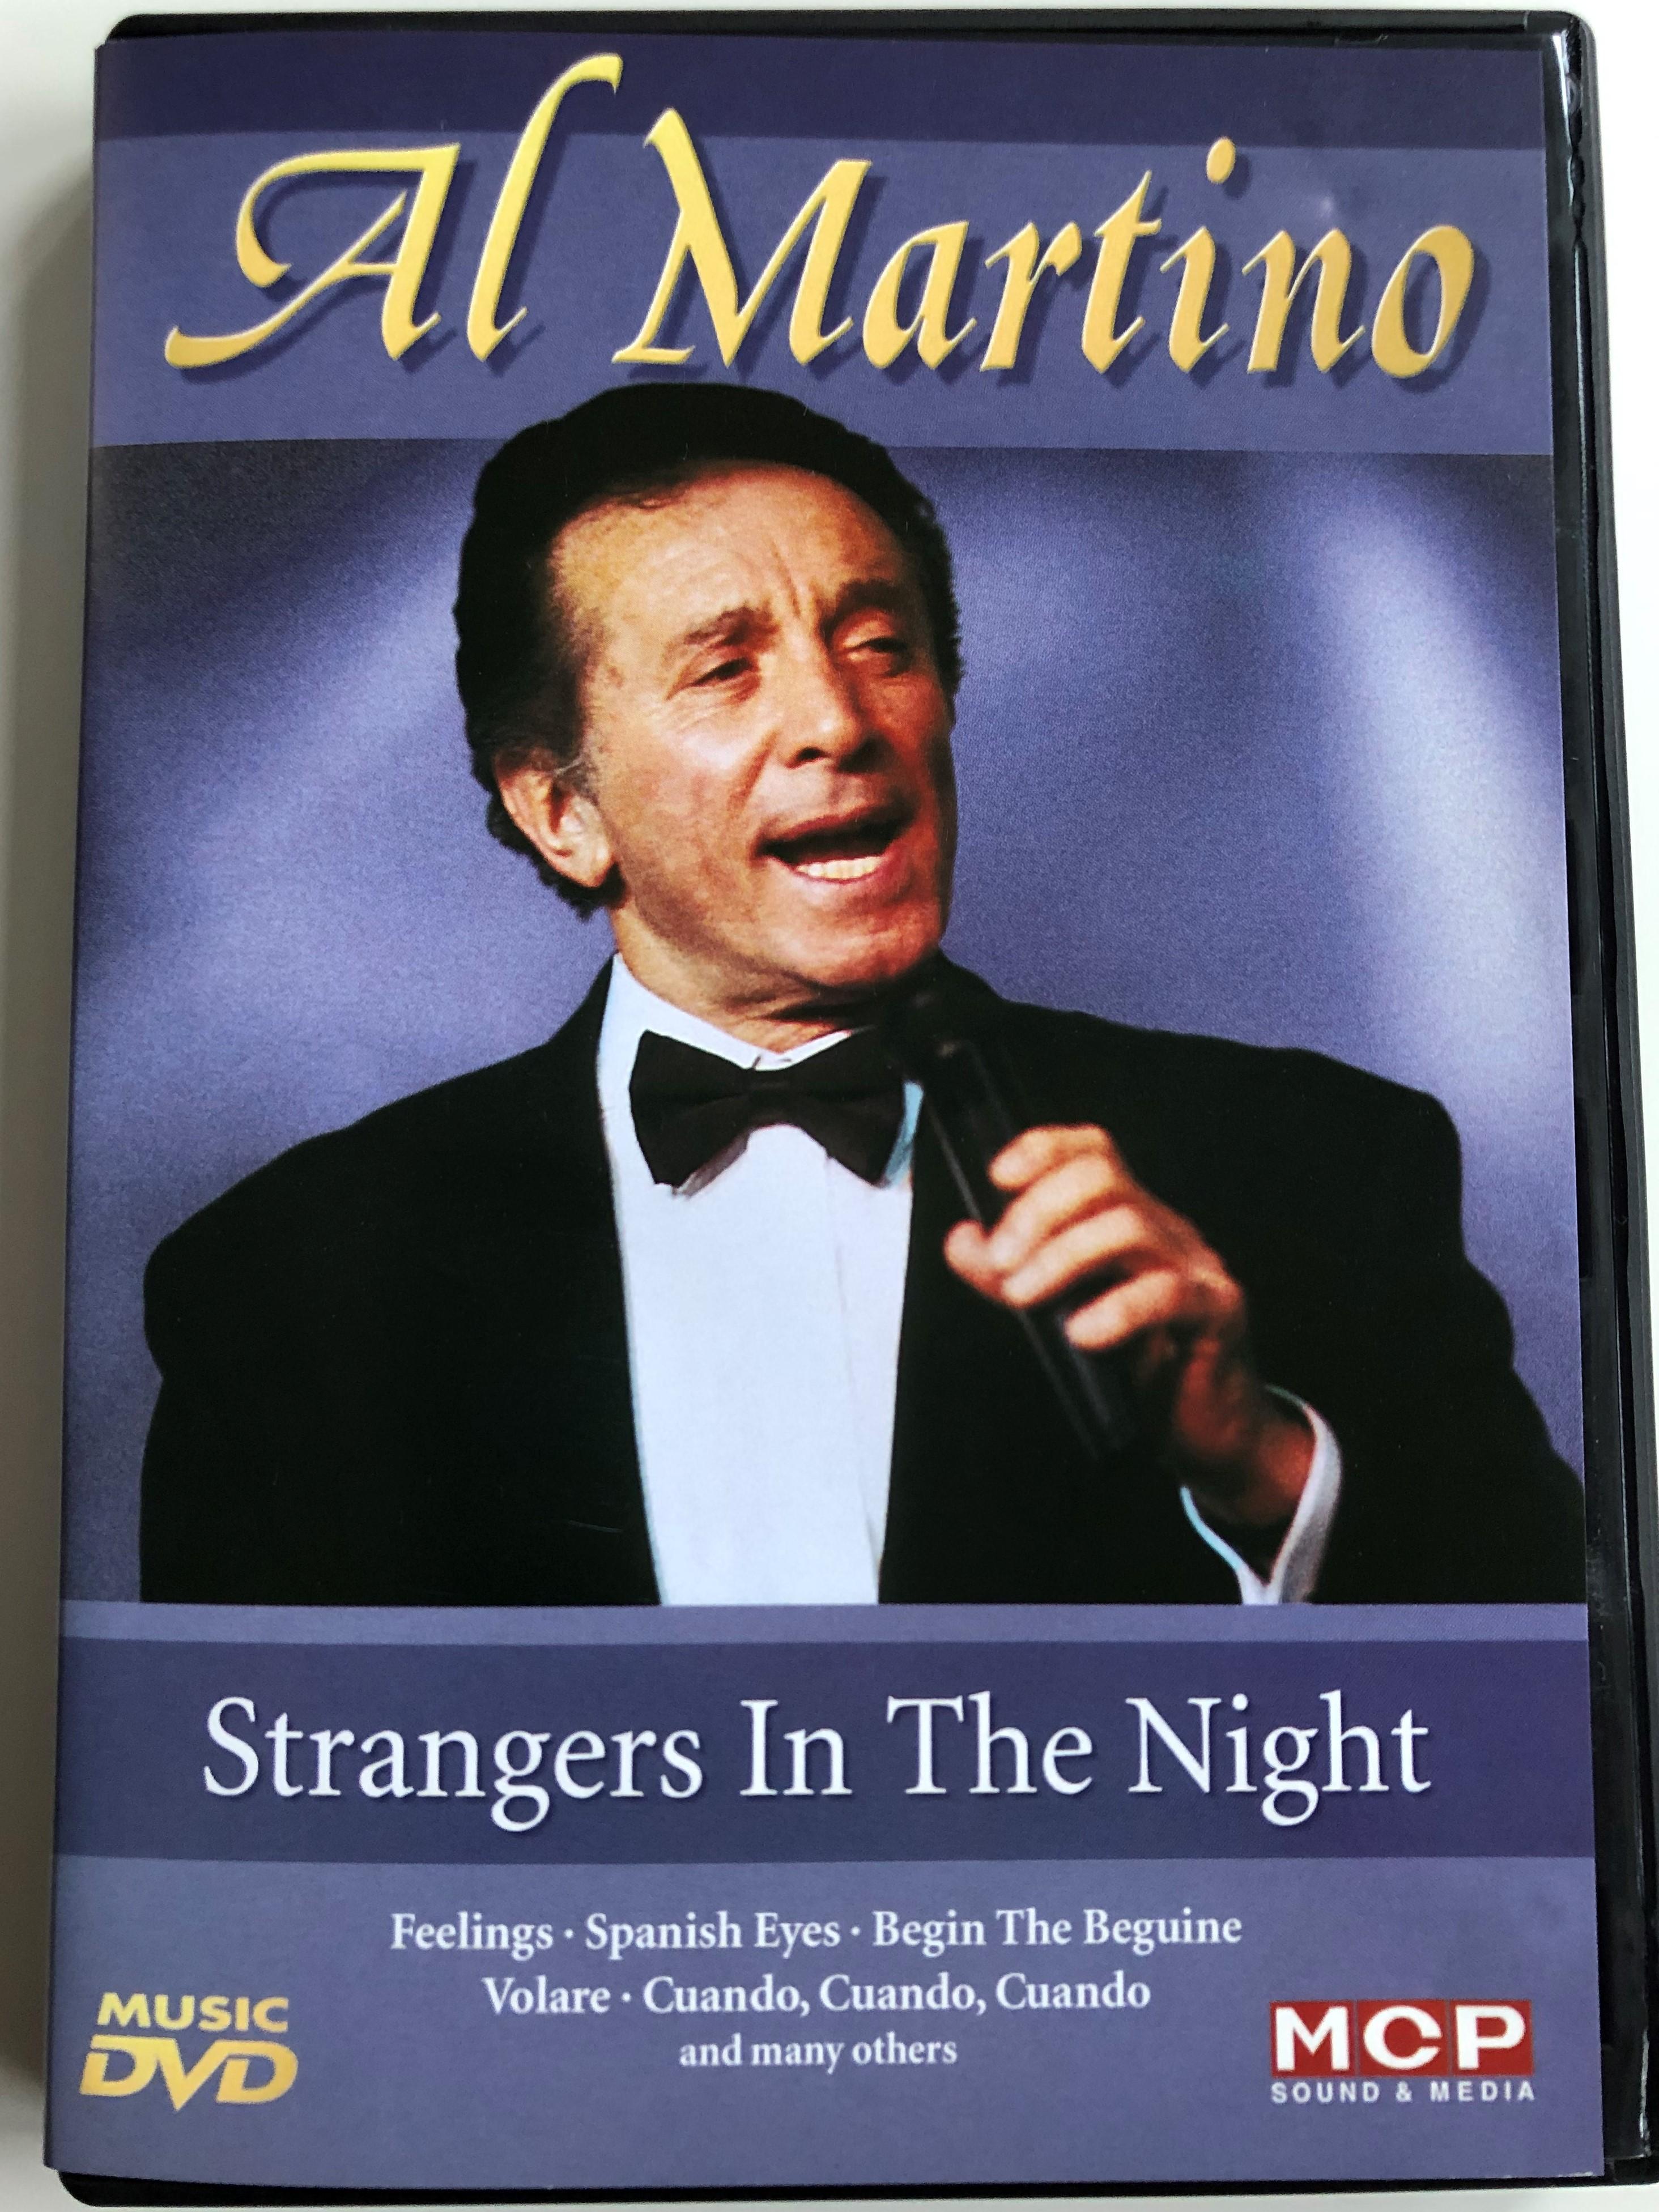 al-martino-strangers-in-the-night-dvd-1.jpg